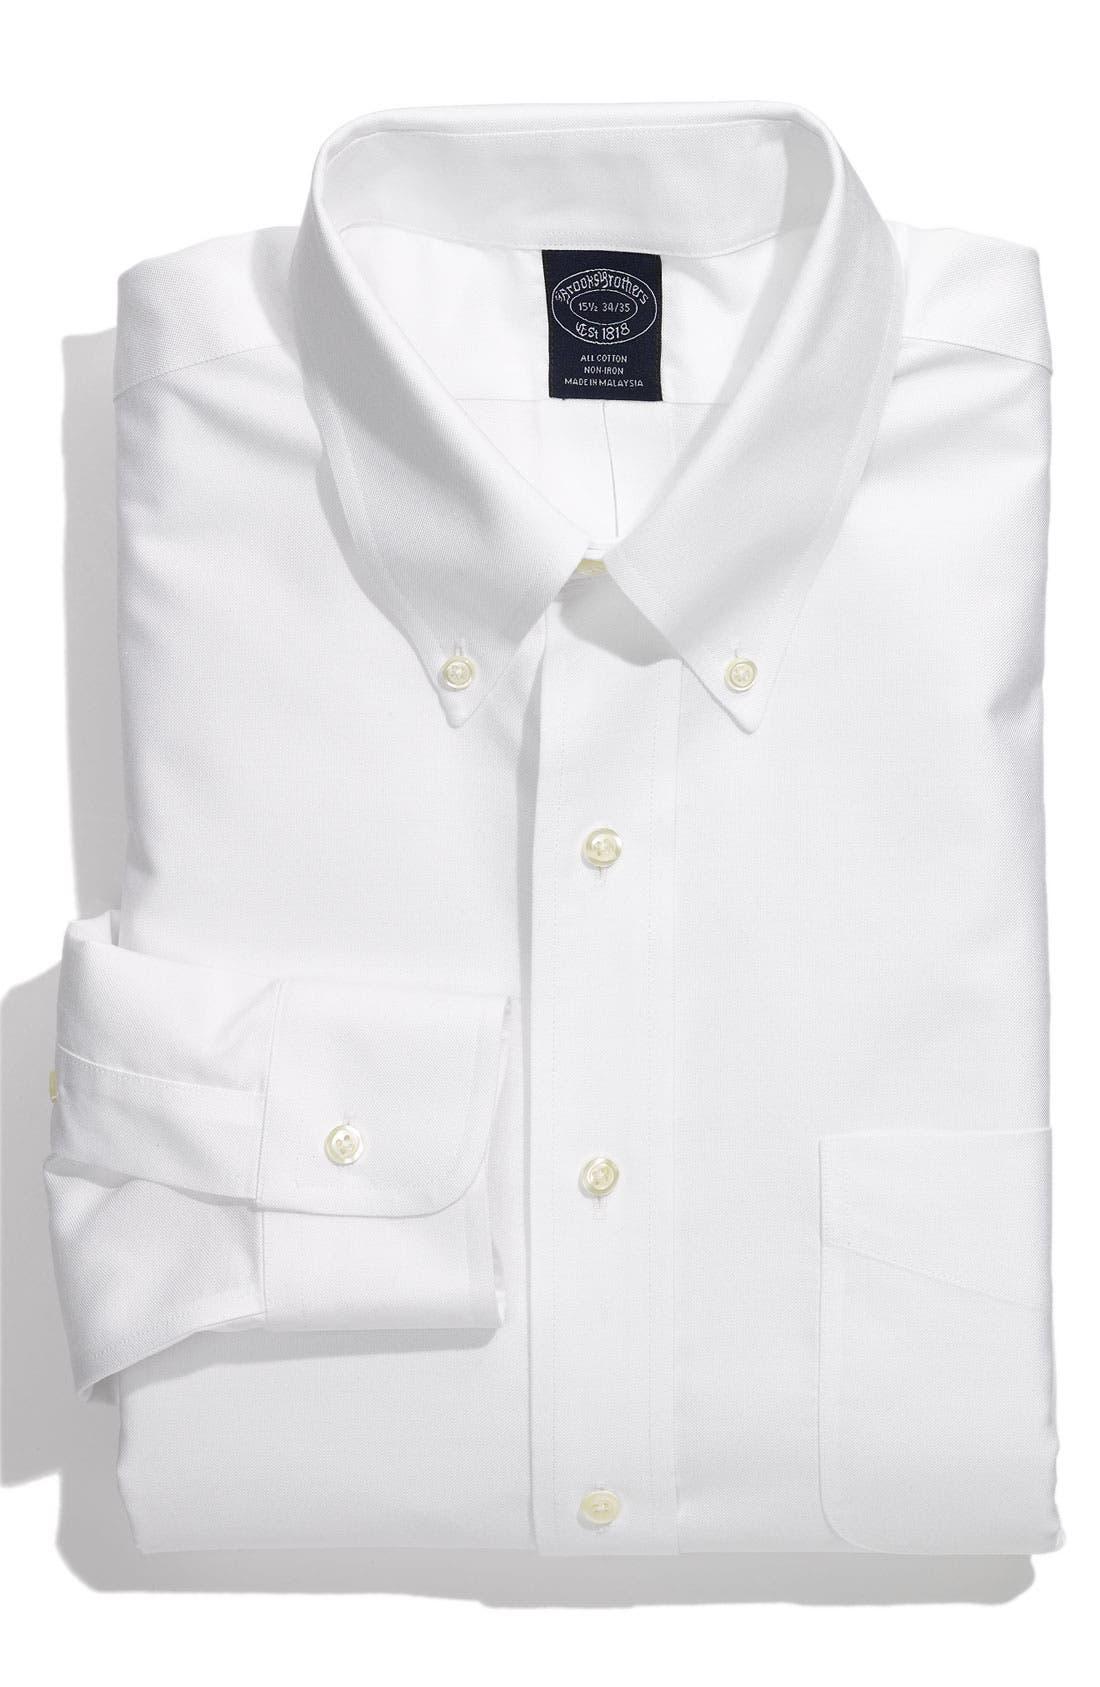 Main Image - Brooks Brothers Non-Iron Oxford Dress Shirt